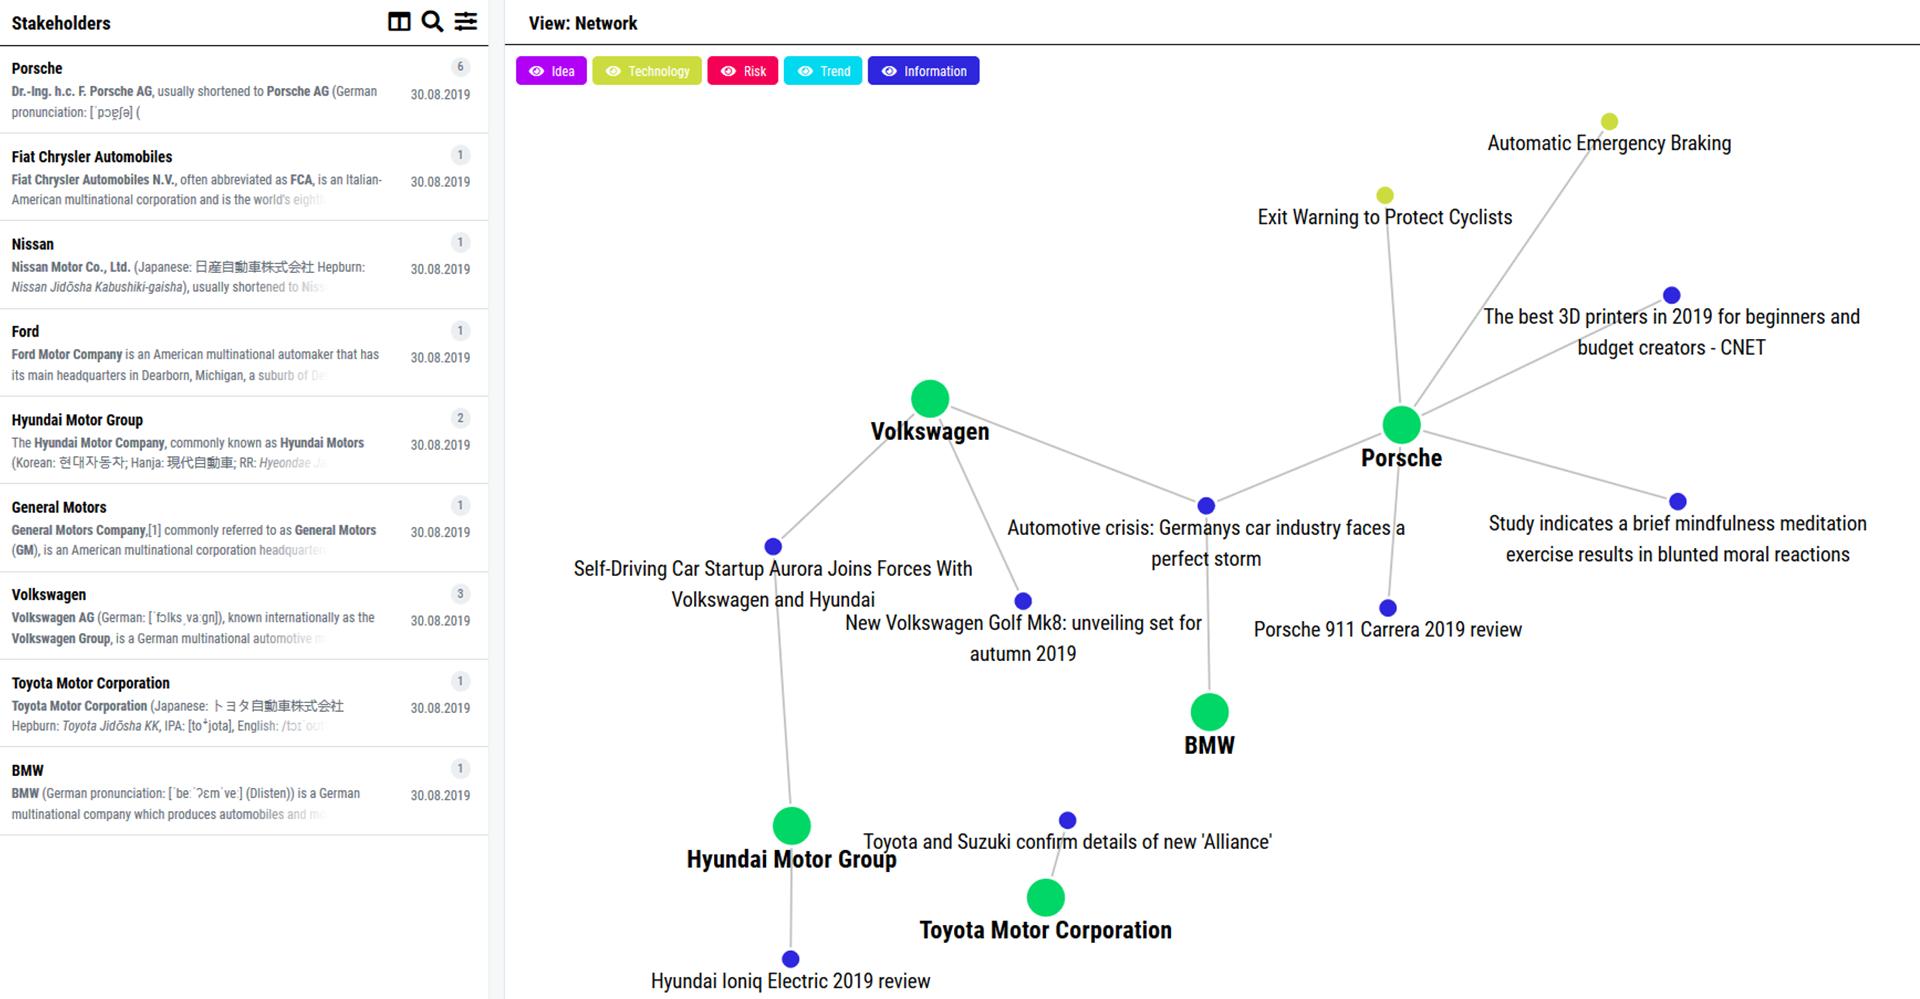 Data-driven scouting & monitoring